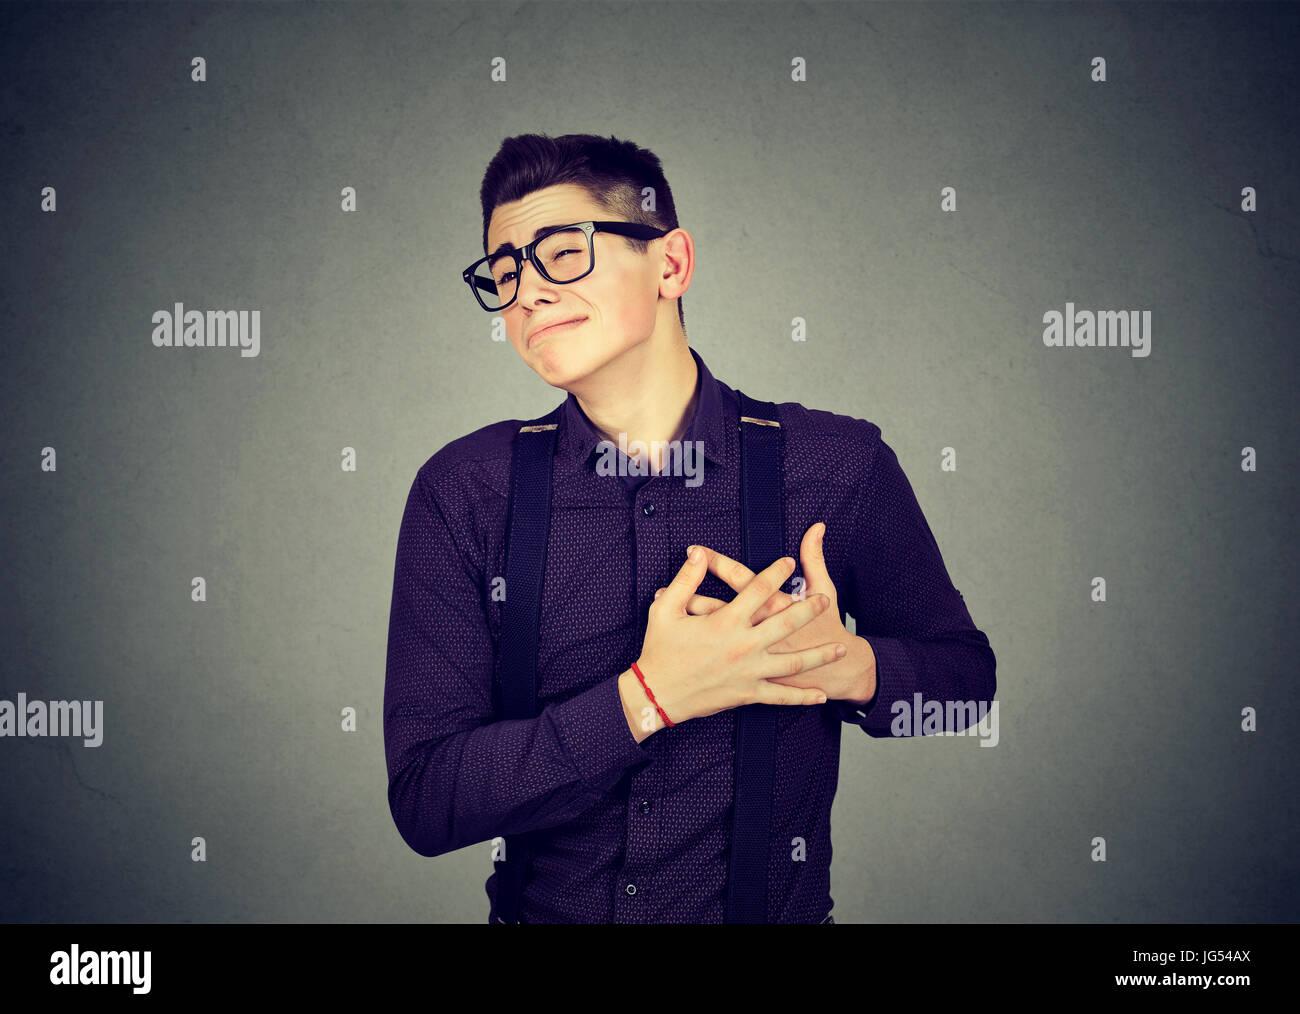 Heartbroken young man - Stock Image